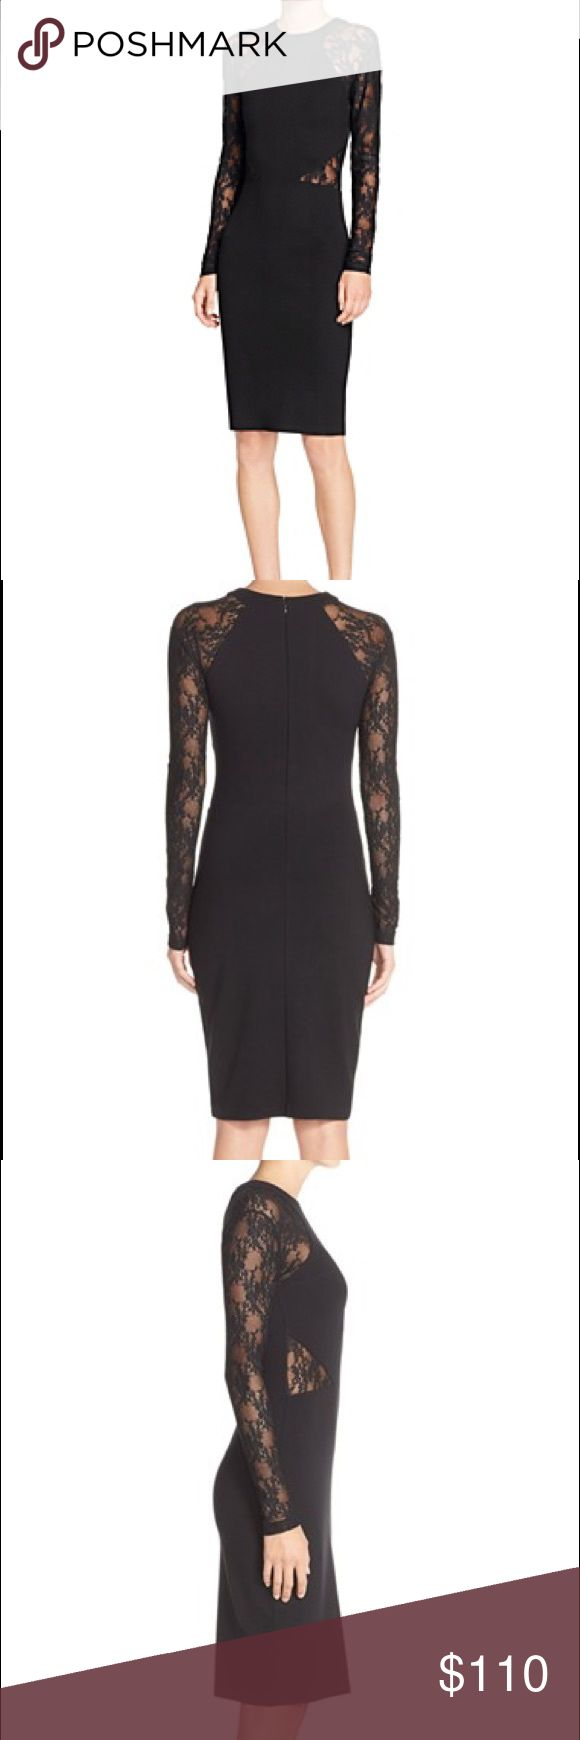 Long black dress size 8 football